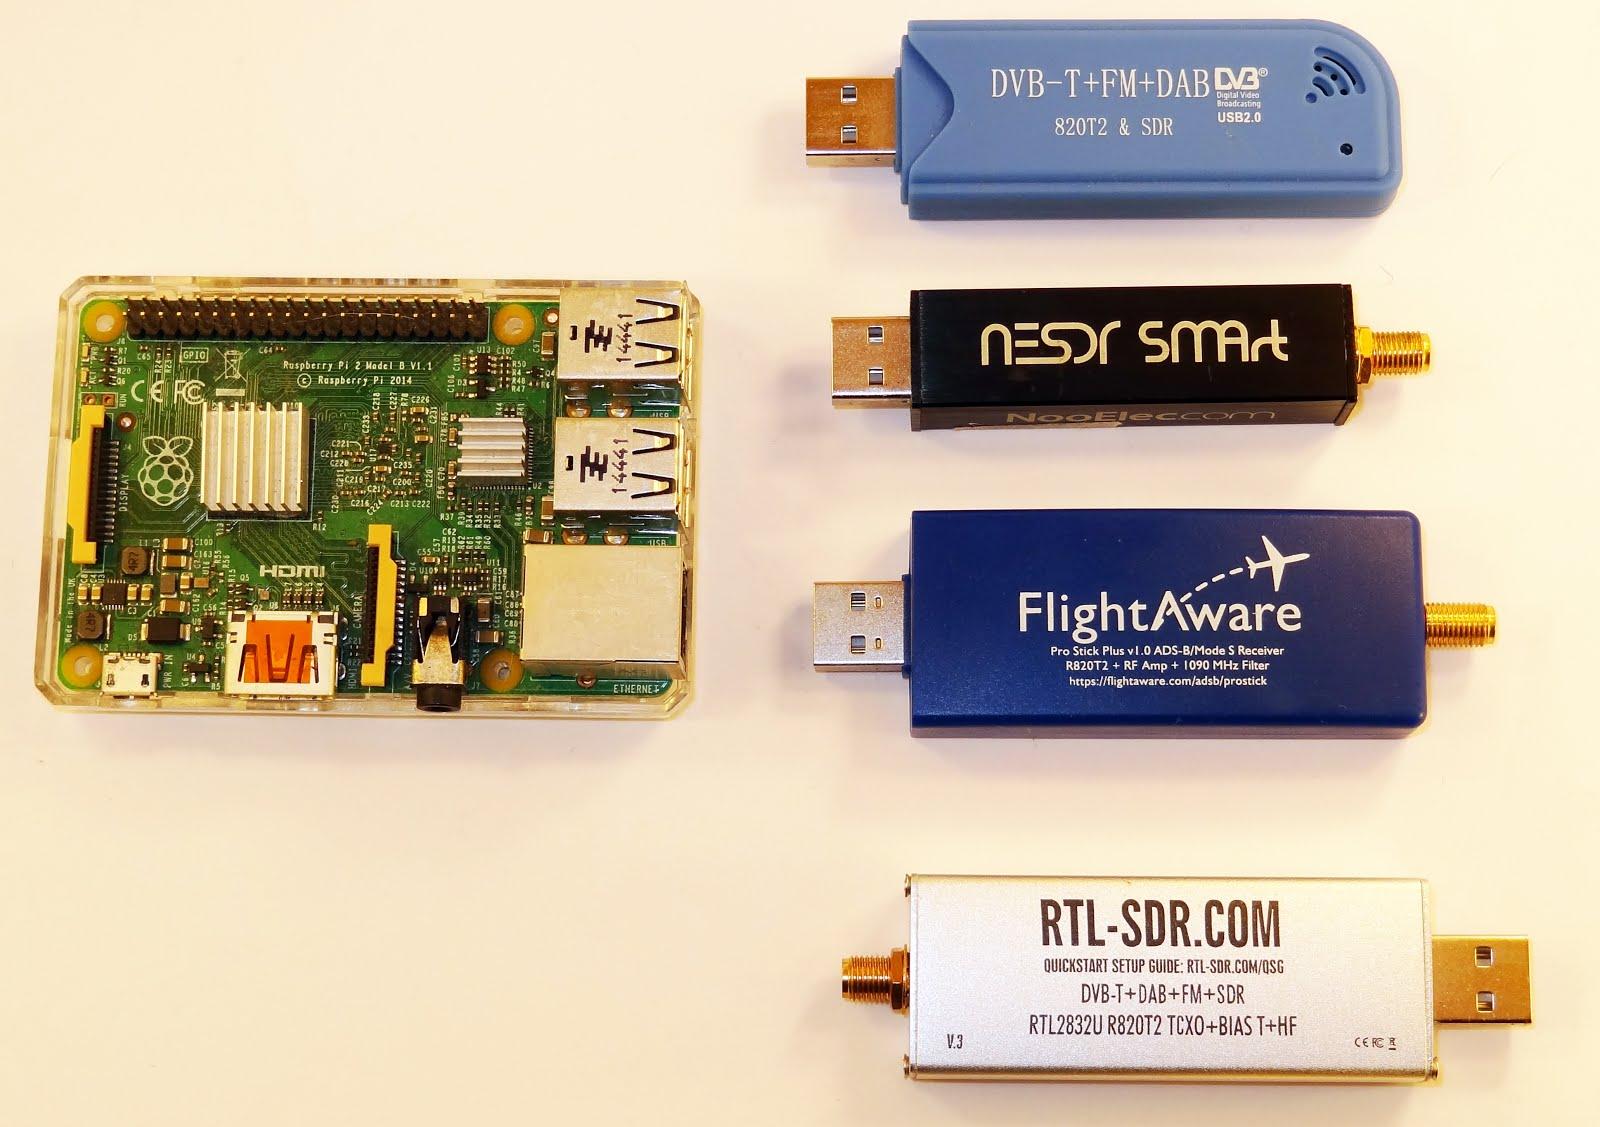 Pi 3 Network Attached Storage, Torrentbox, ADS-B server   Radio for